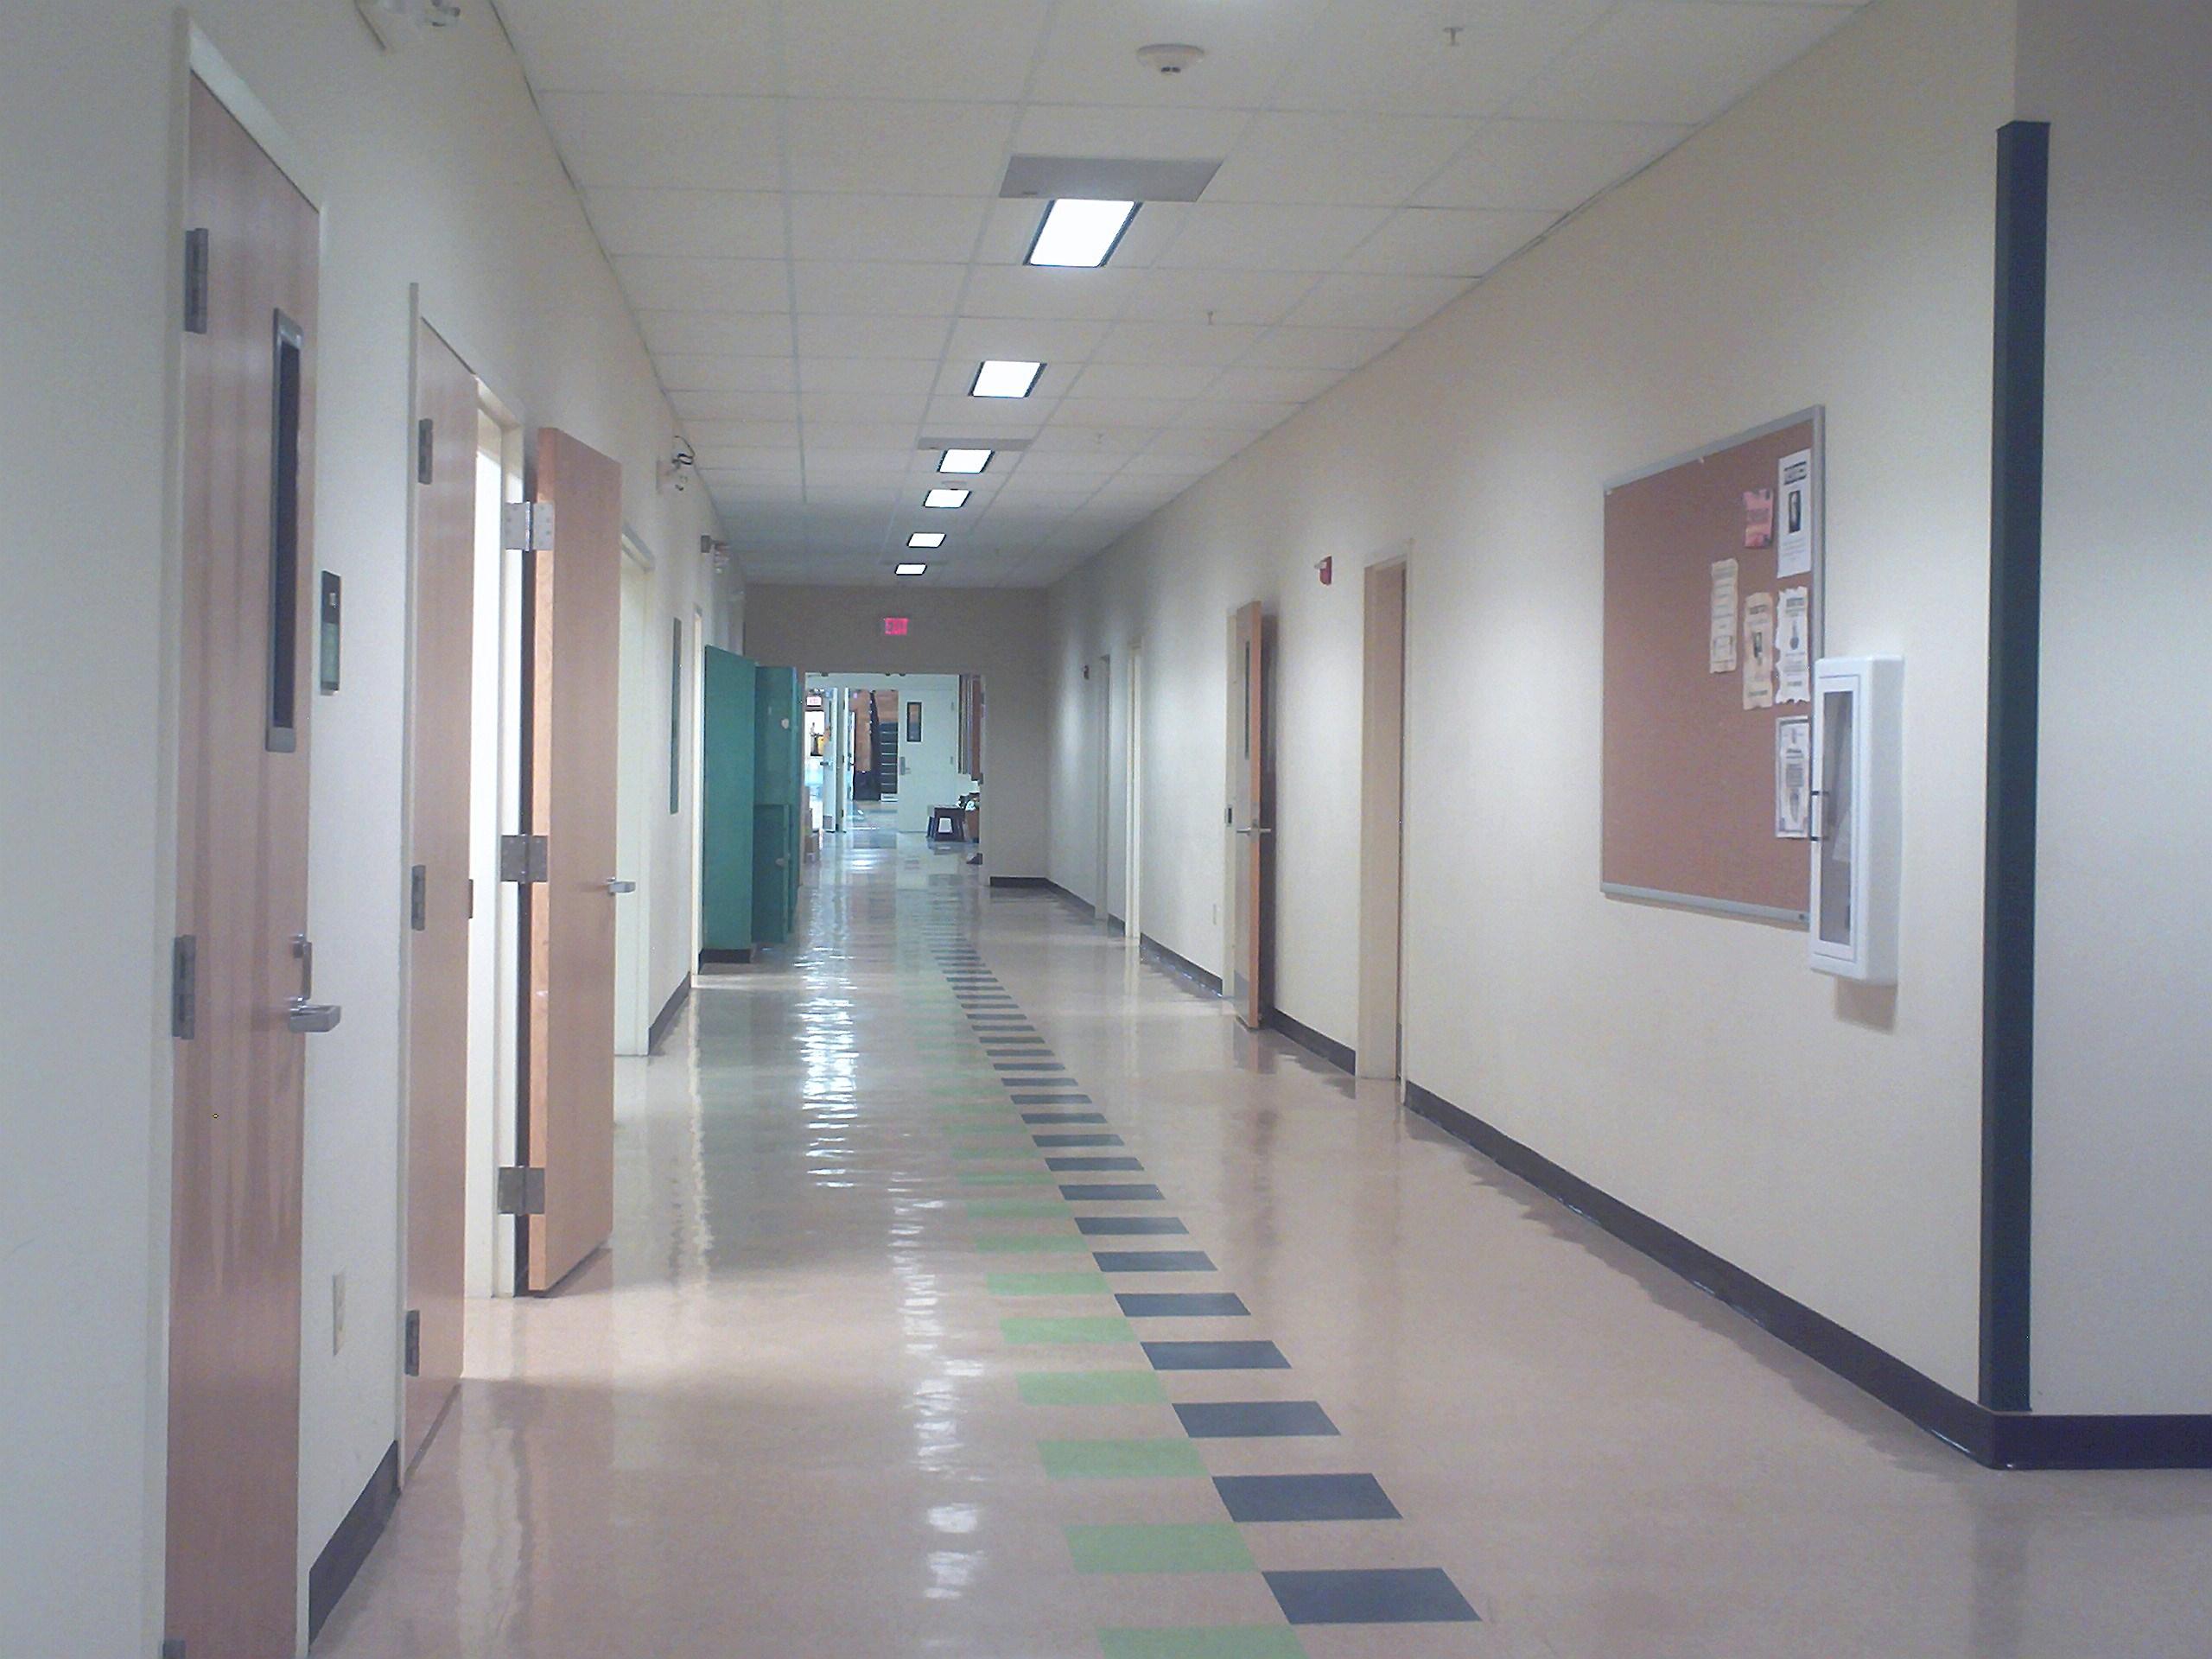 3d Wallpaper Decorating Ideas File Penobscot Valley High School Main Hallway Jpg